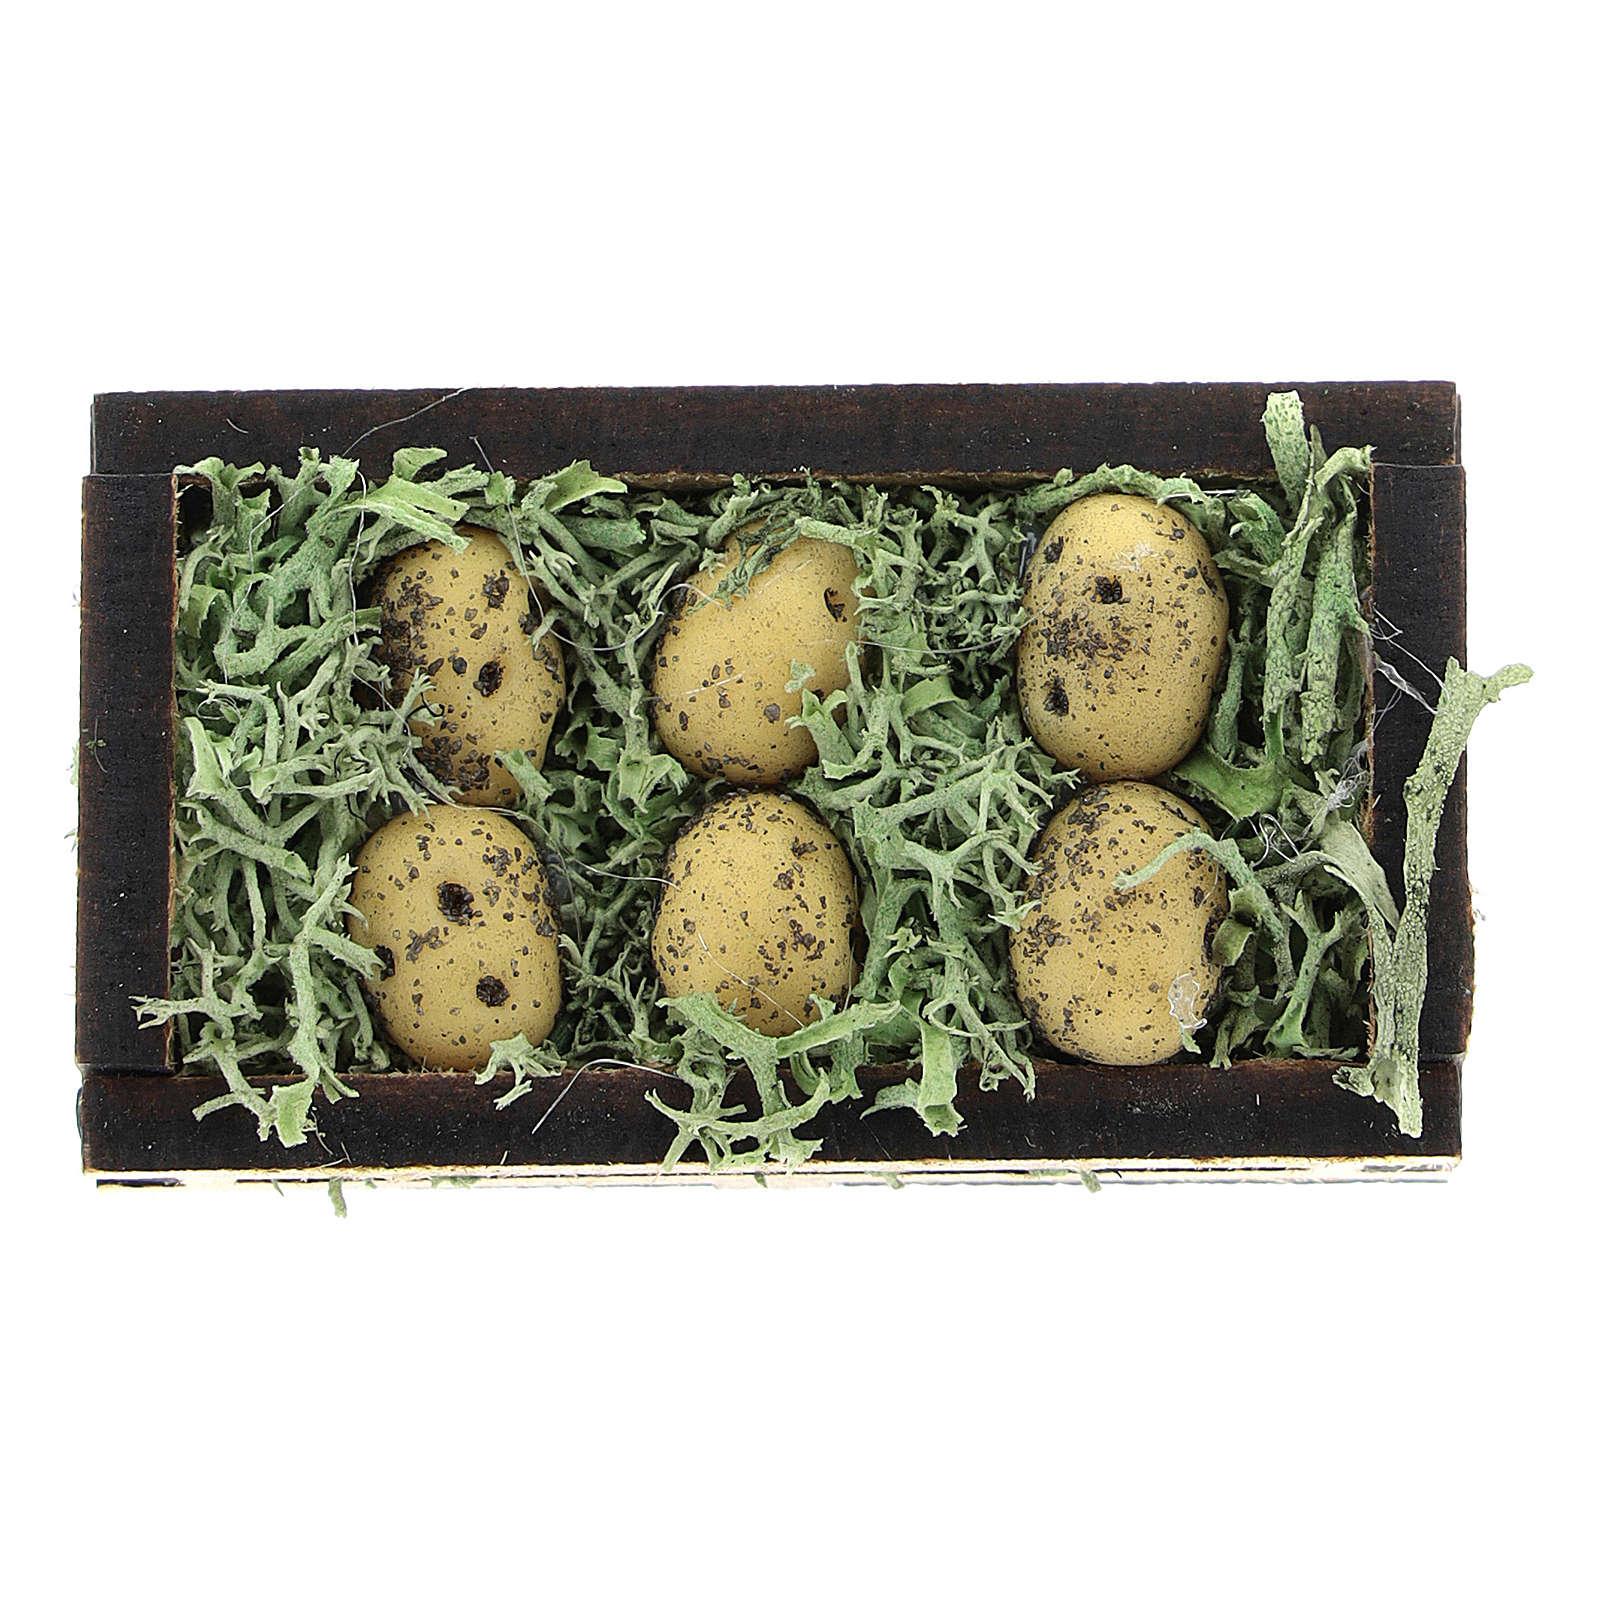 Cassa patate presepe in legno e resina 4 cm 4